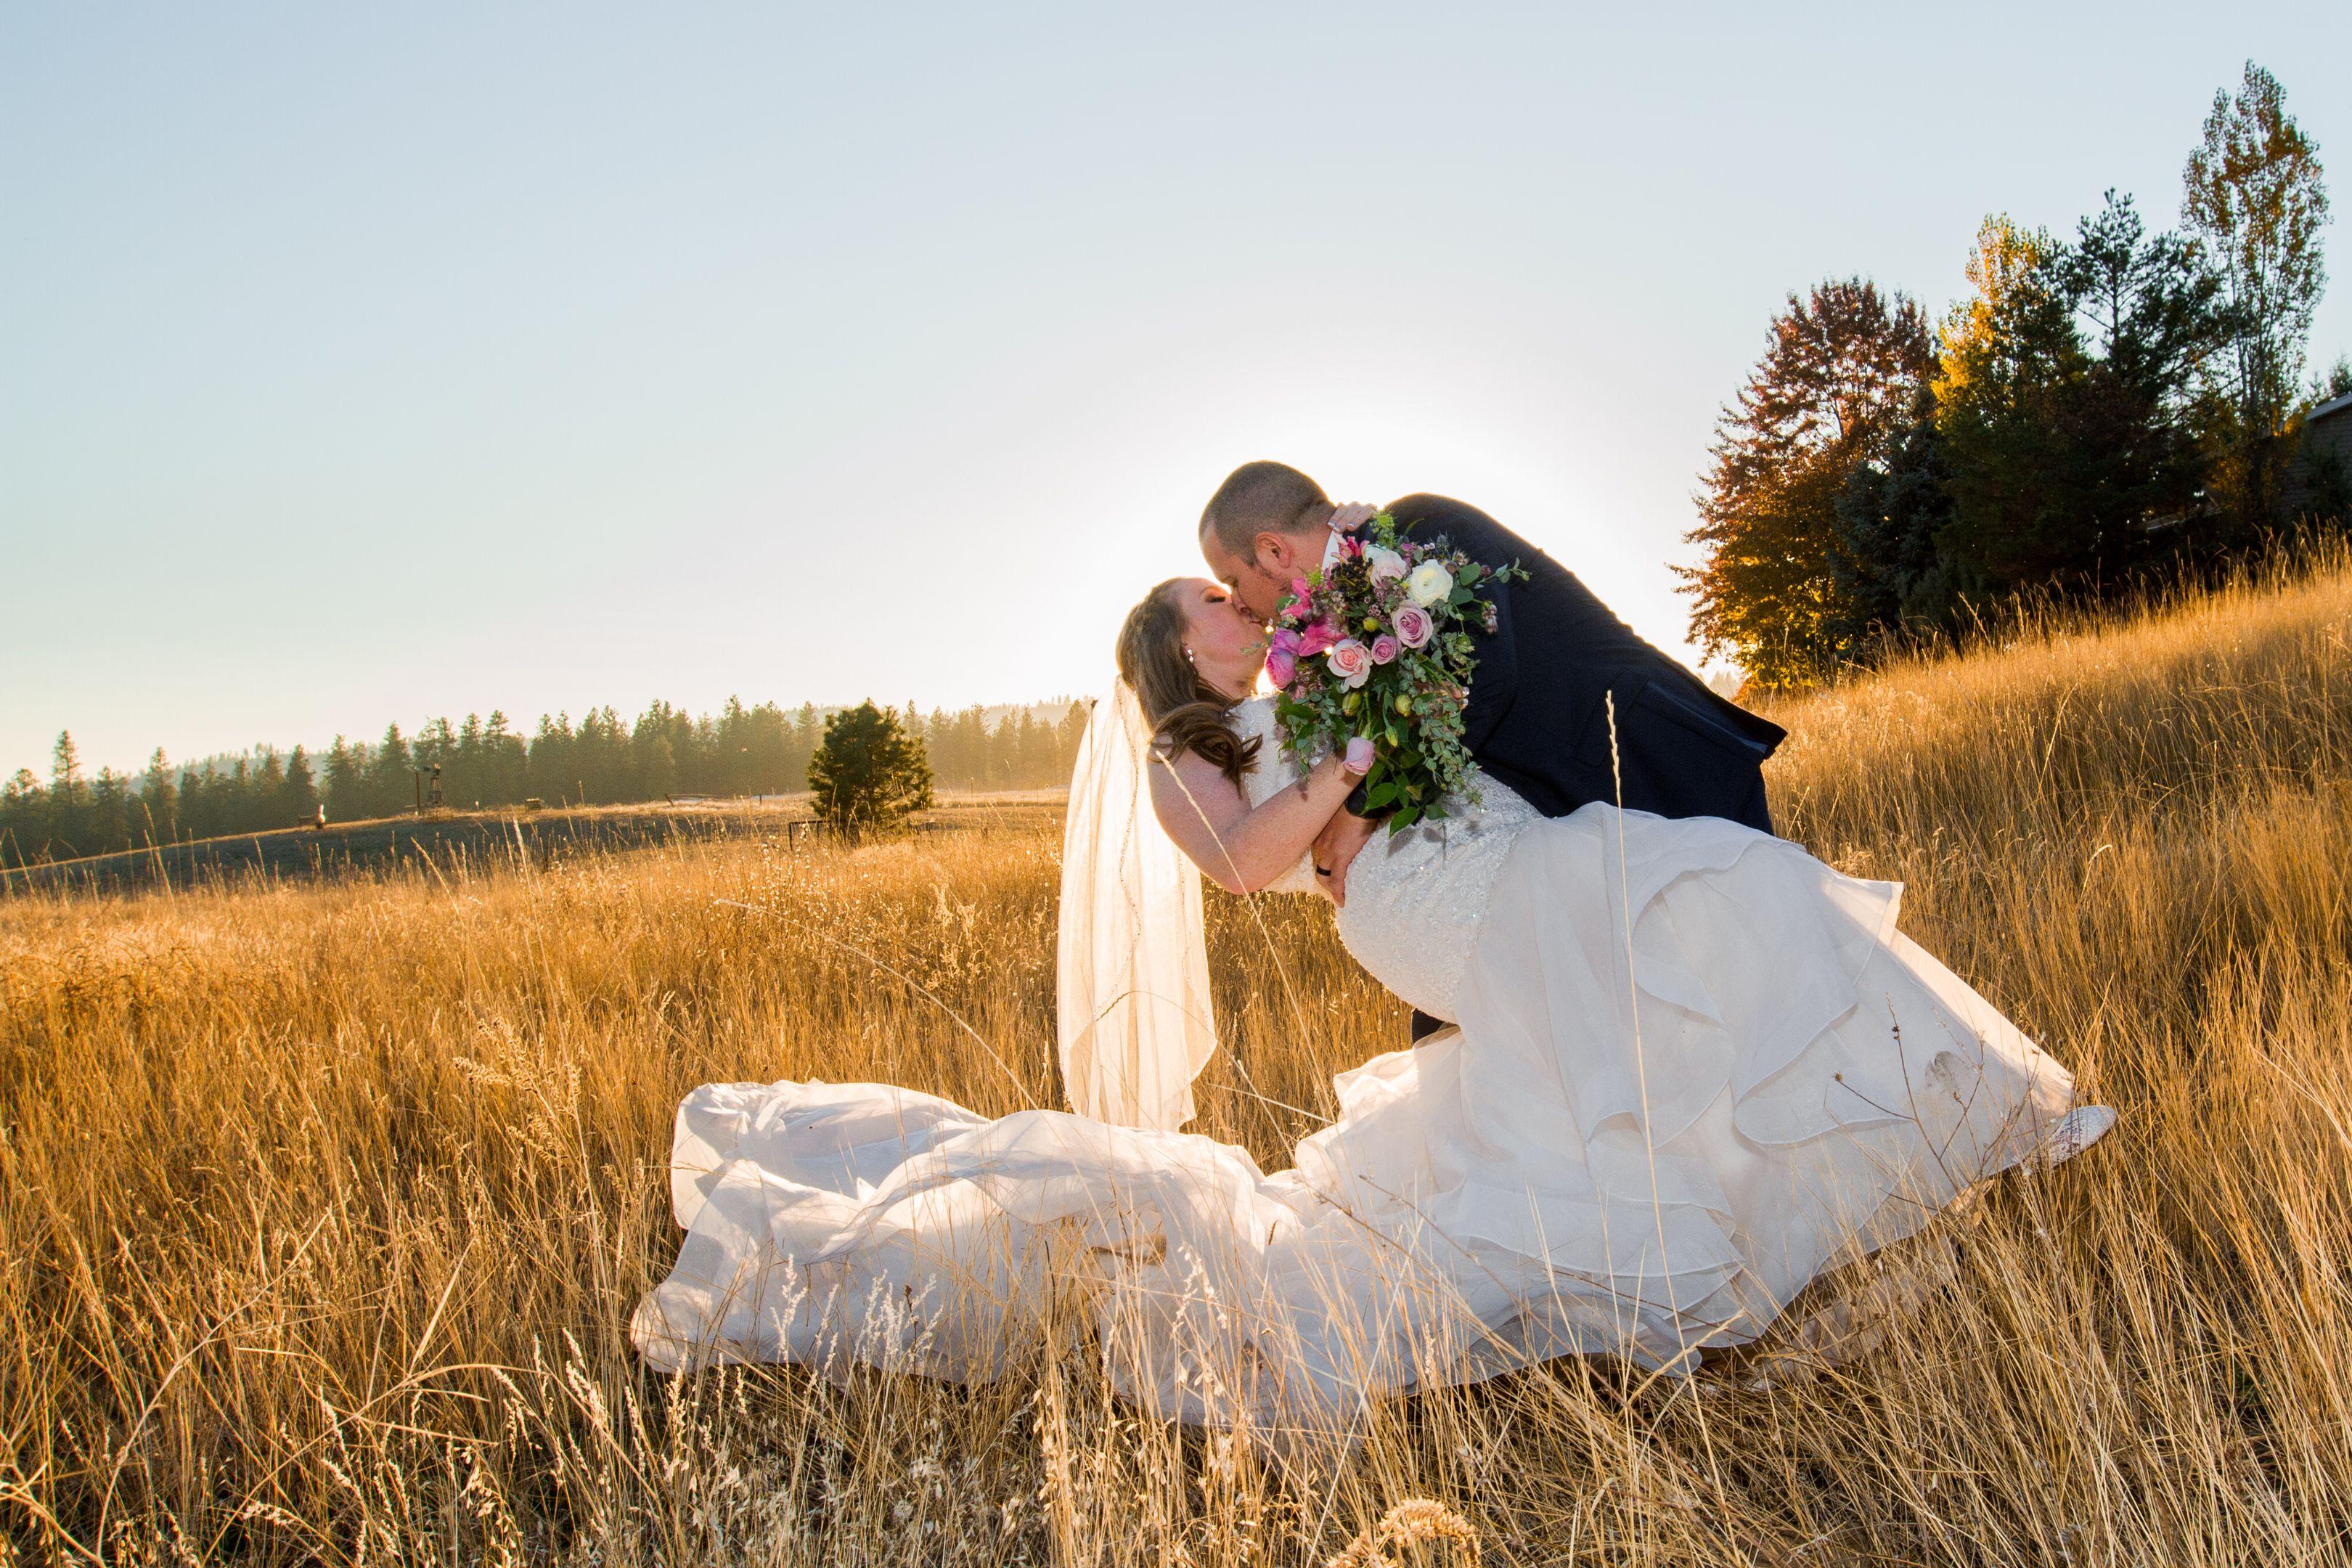 Jenifer & Russ' Spokane Autumn Wedding